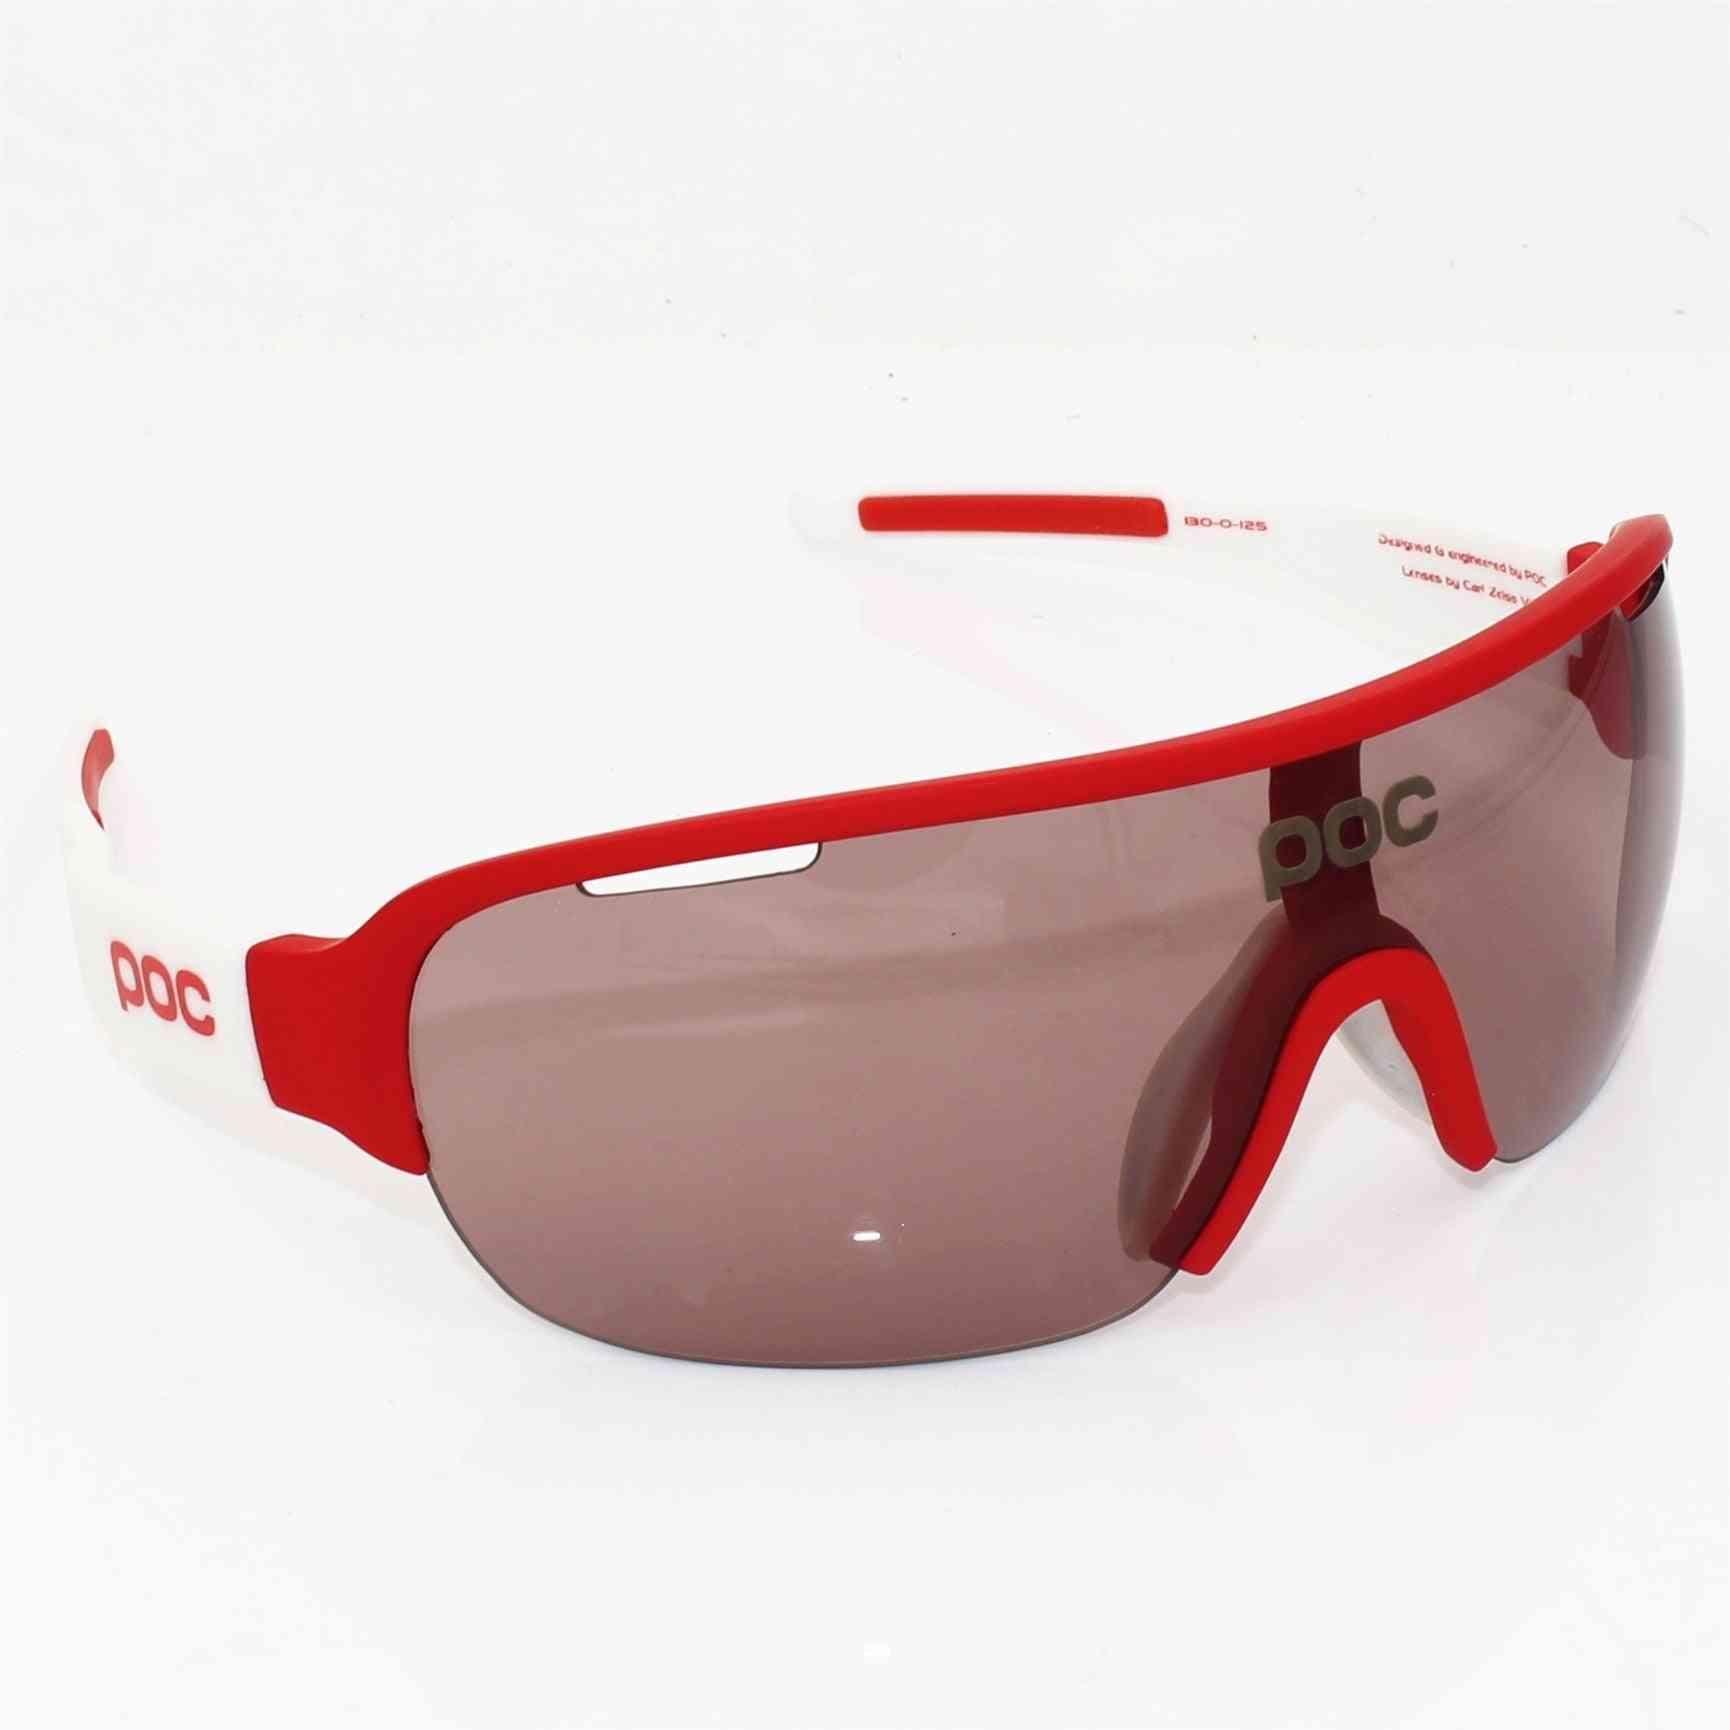 Cycling Sunglasses 3 Lens Sport Road Mountain Bike Glasses, Eyewear Goggles